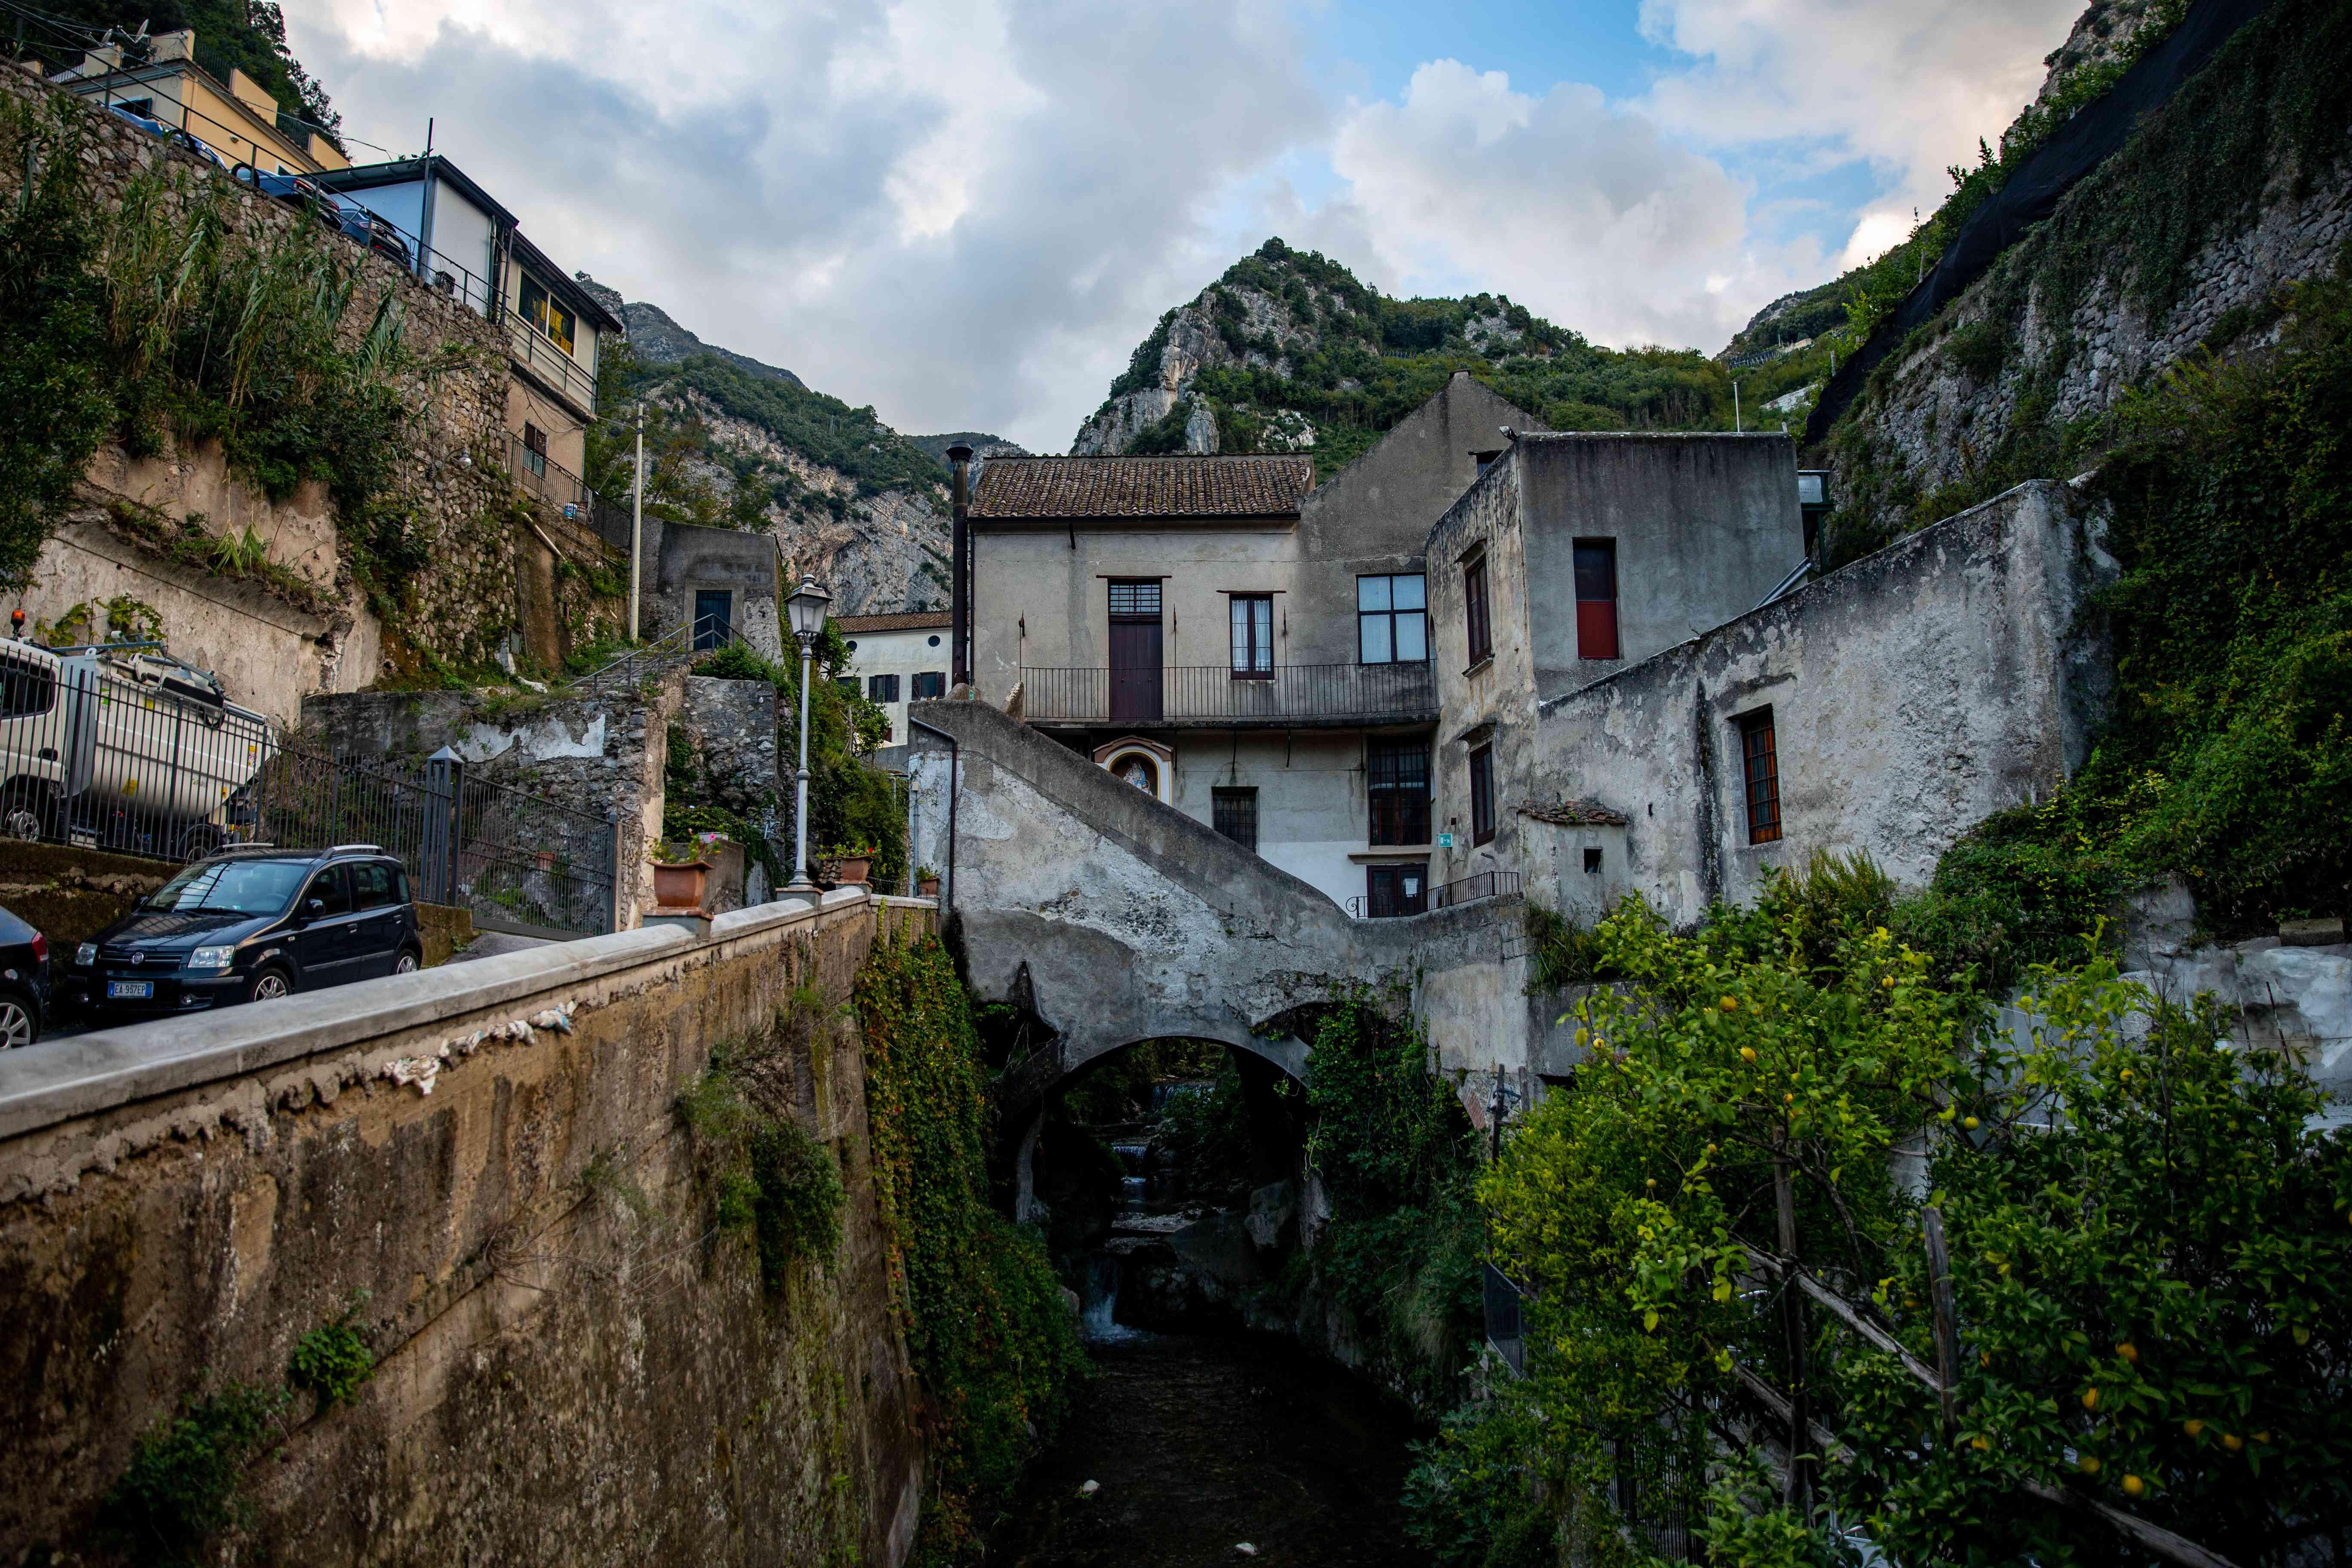 Valle dei Mulini in Sorrento, Italy